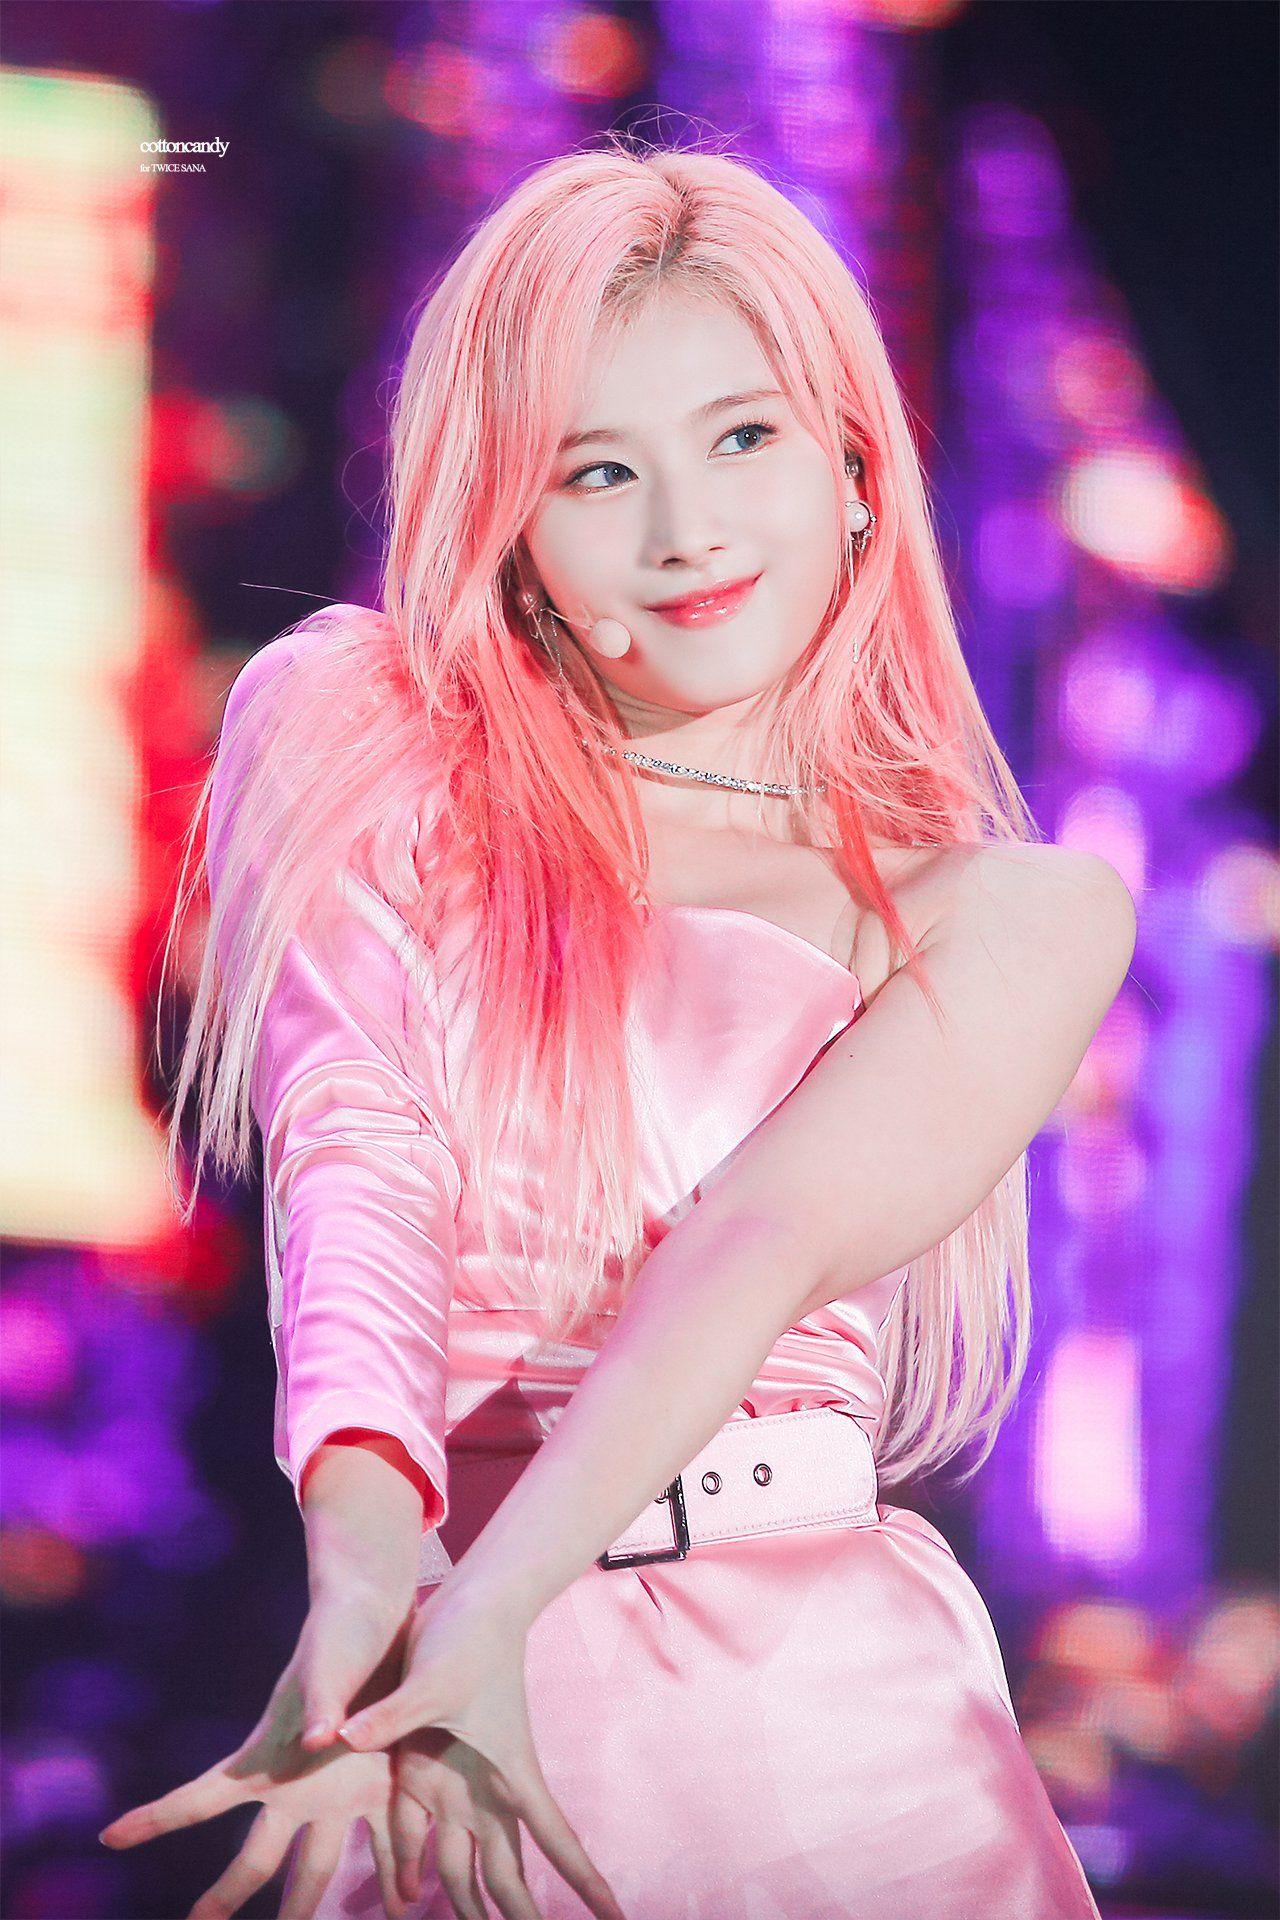 CottonCandy on Twitter | Kpop girl groups, Kpop girls, Twice sana